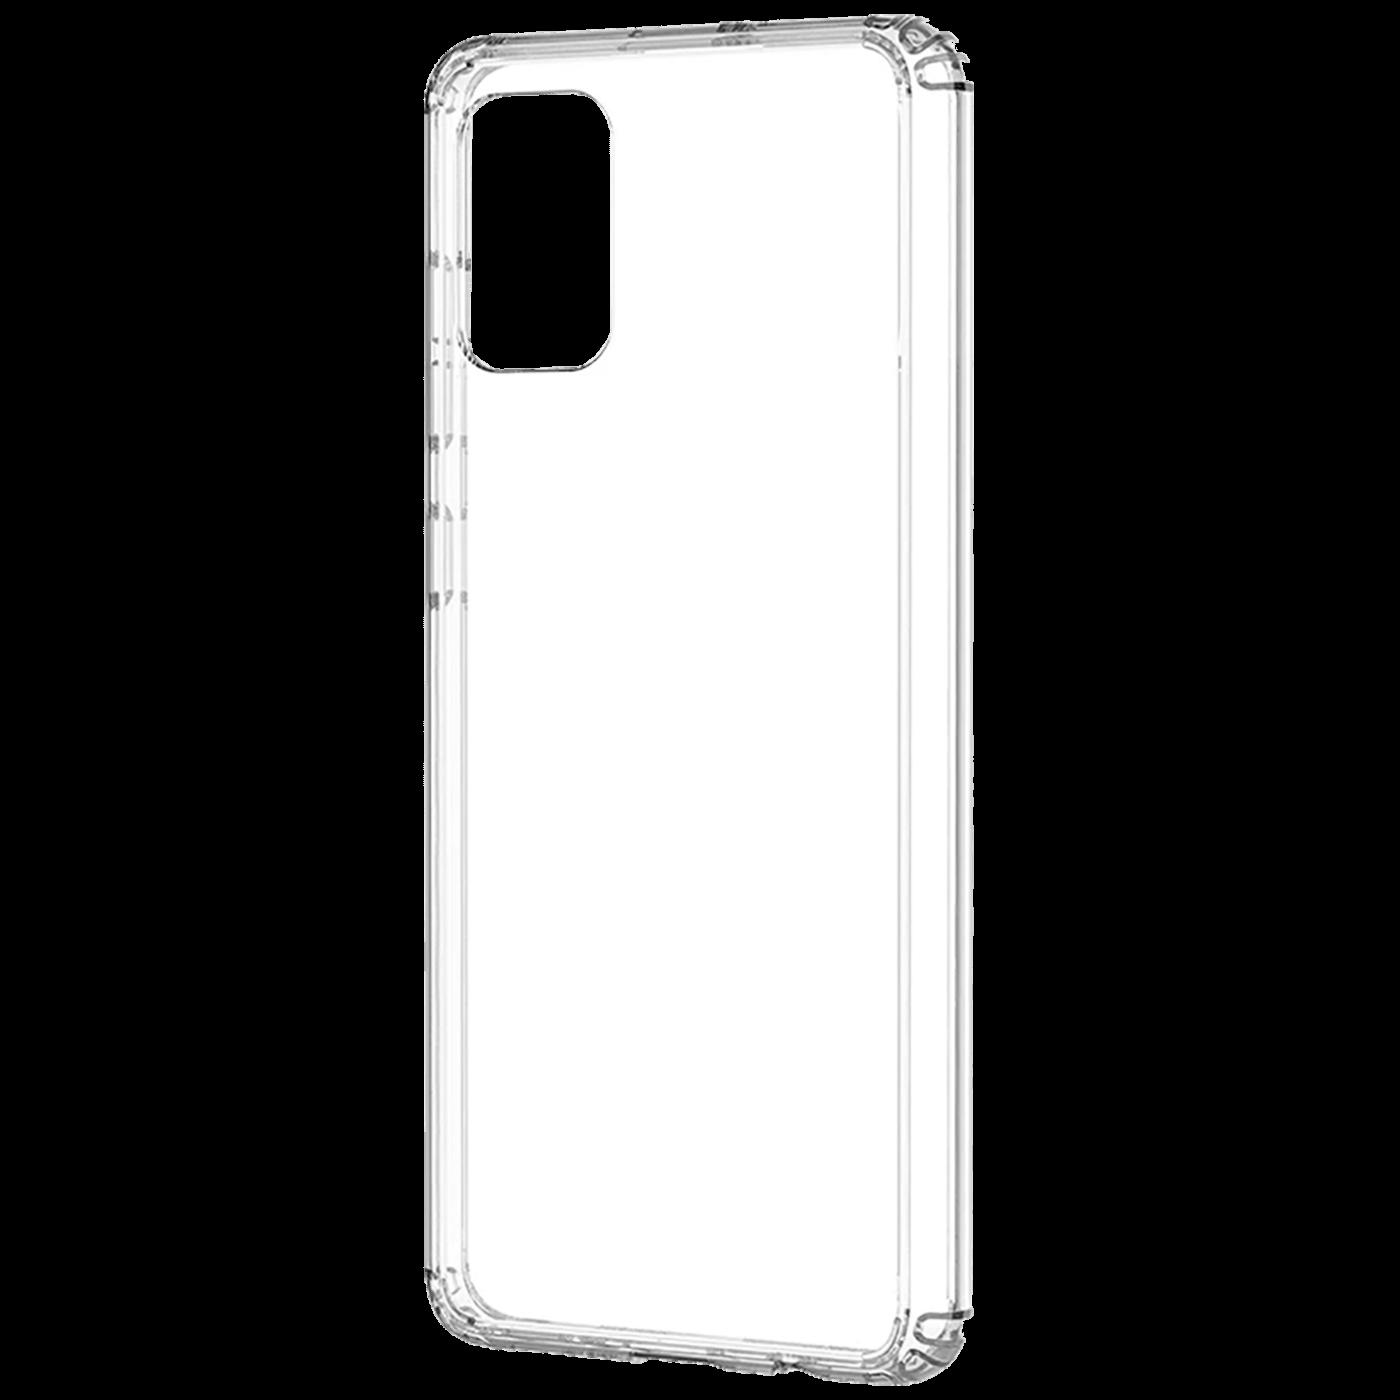 Futrola za mobitel Samsung A71, A51, silikonska, transparent